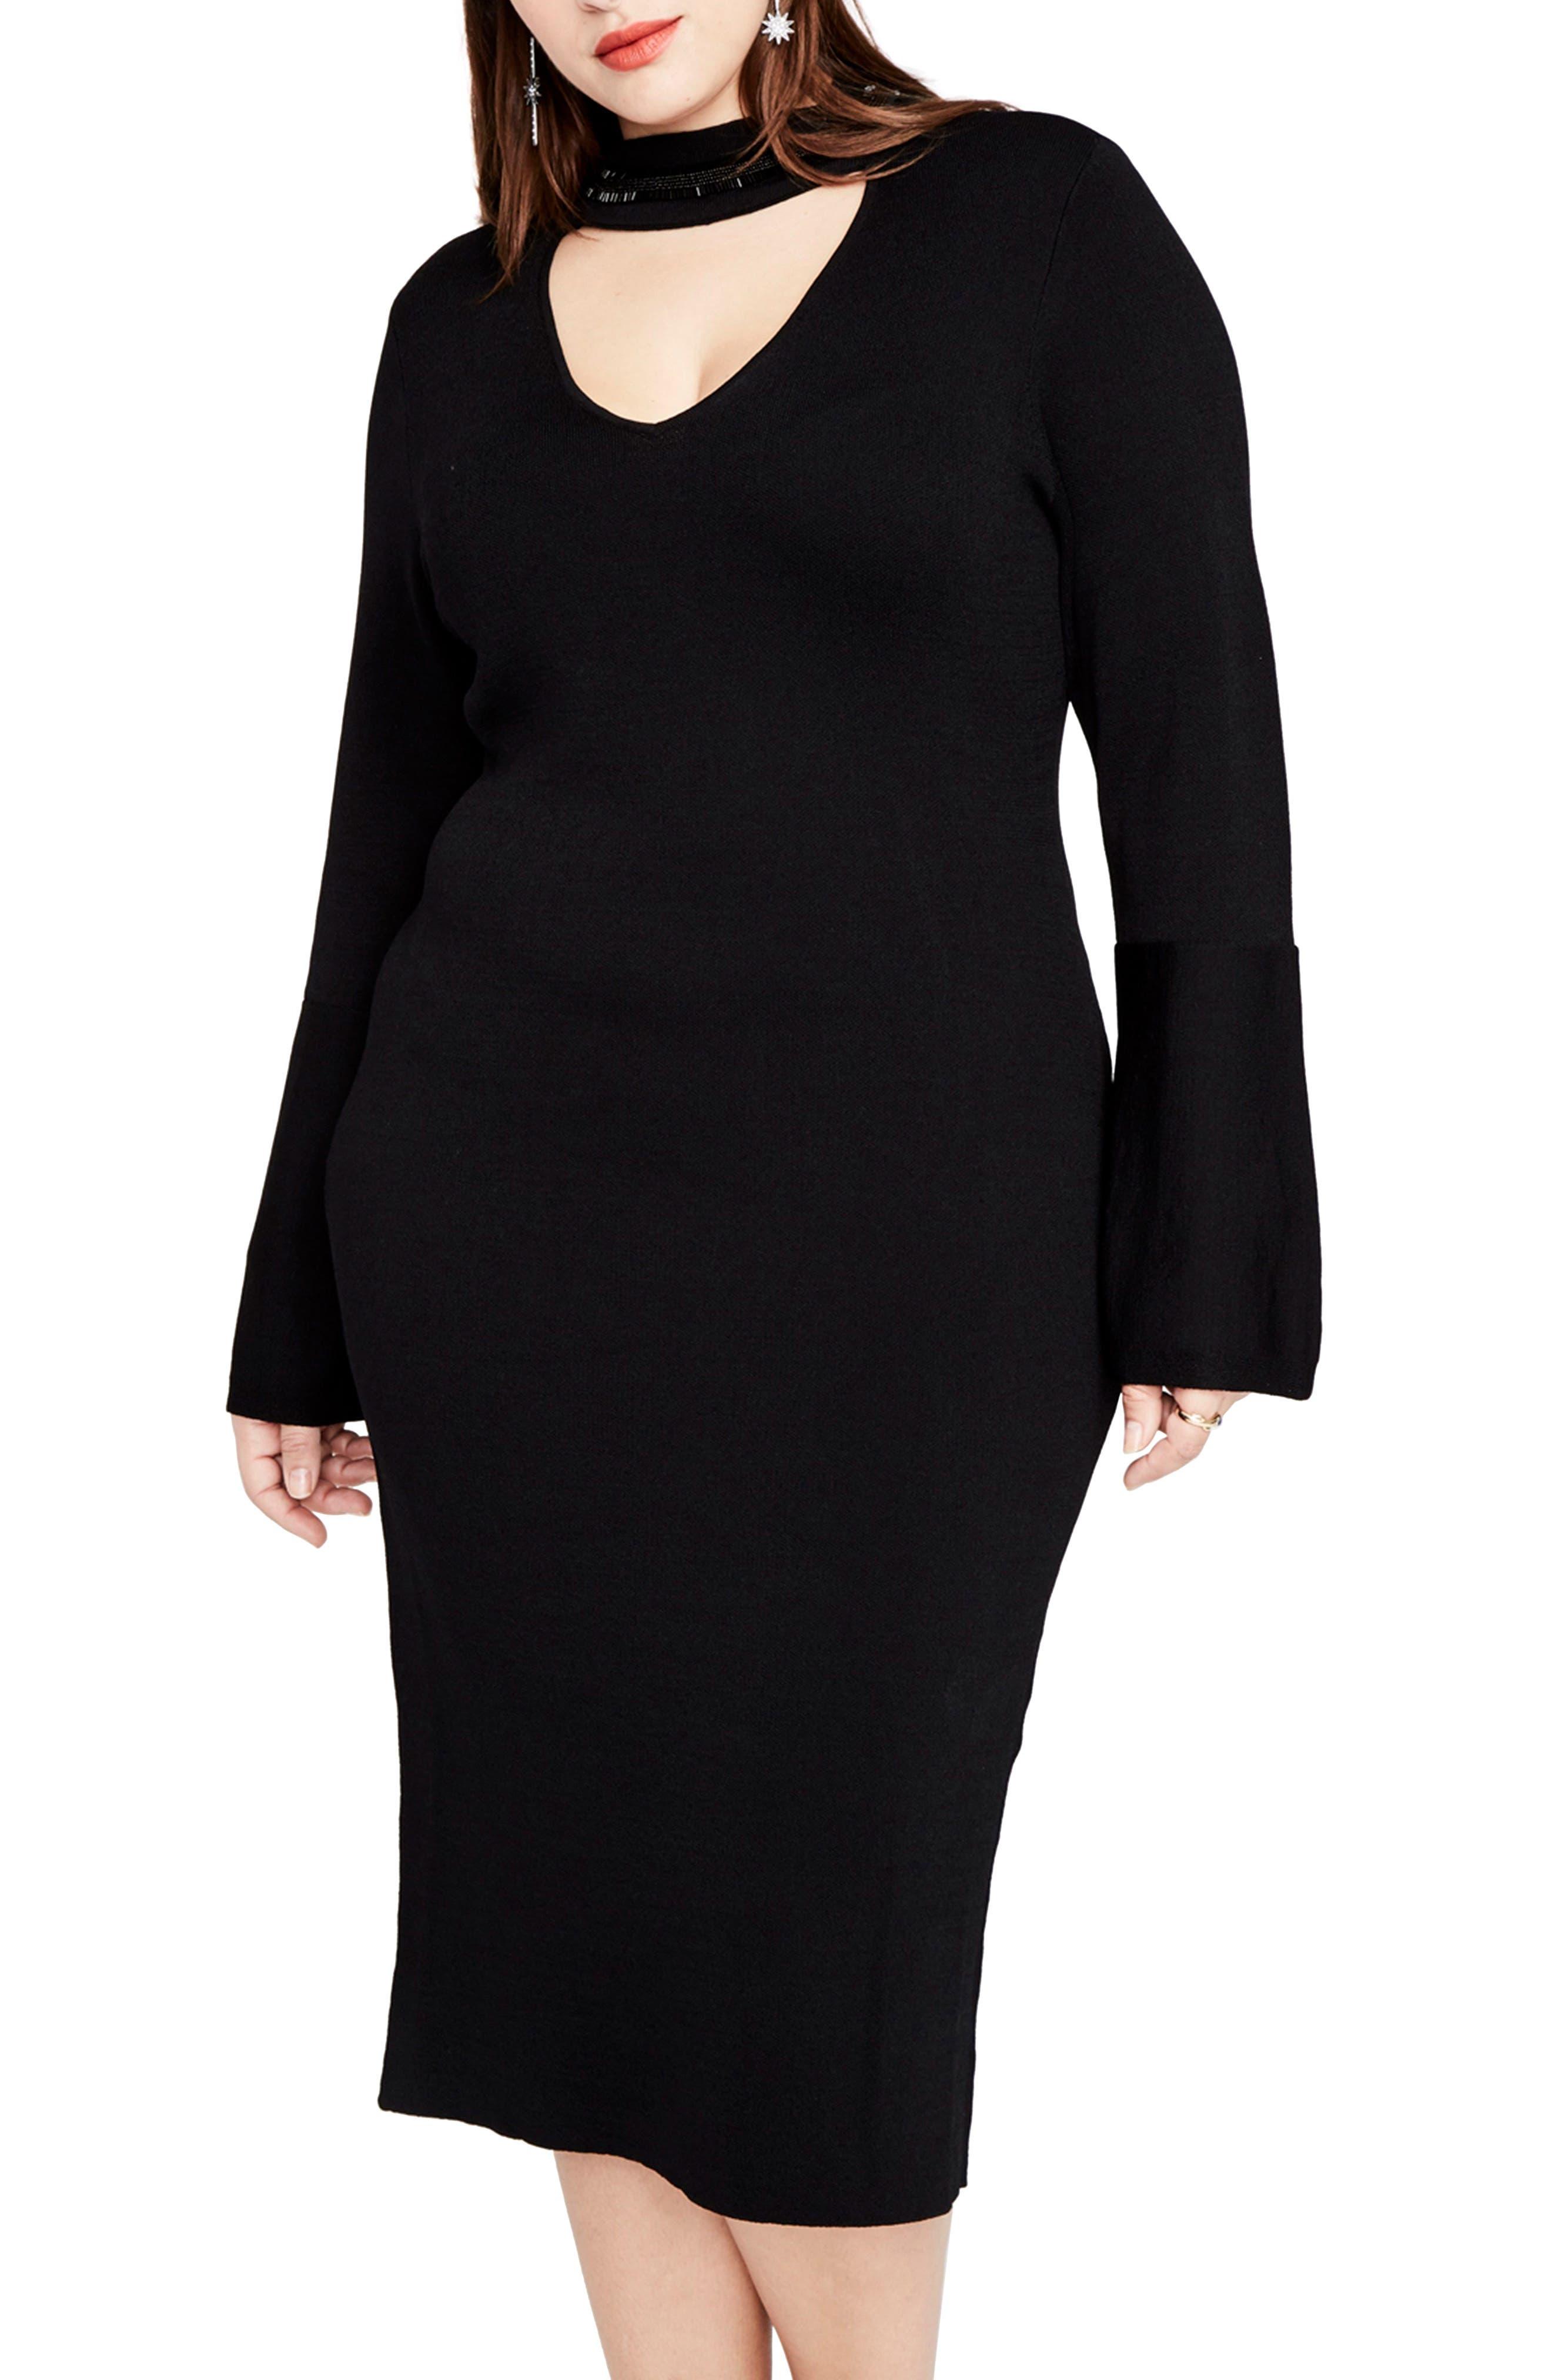 RACHEL RACHEL ROY,                             Choker Neck Sweater Dress,                             Alternate thumbnail 3, color,                             001